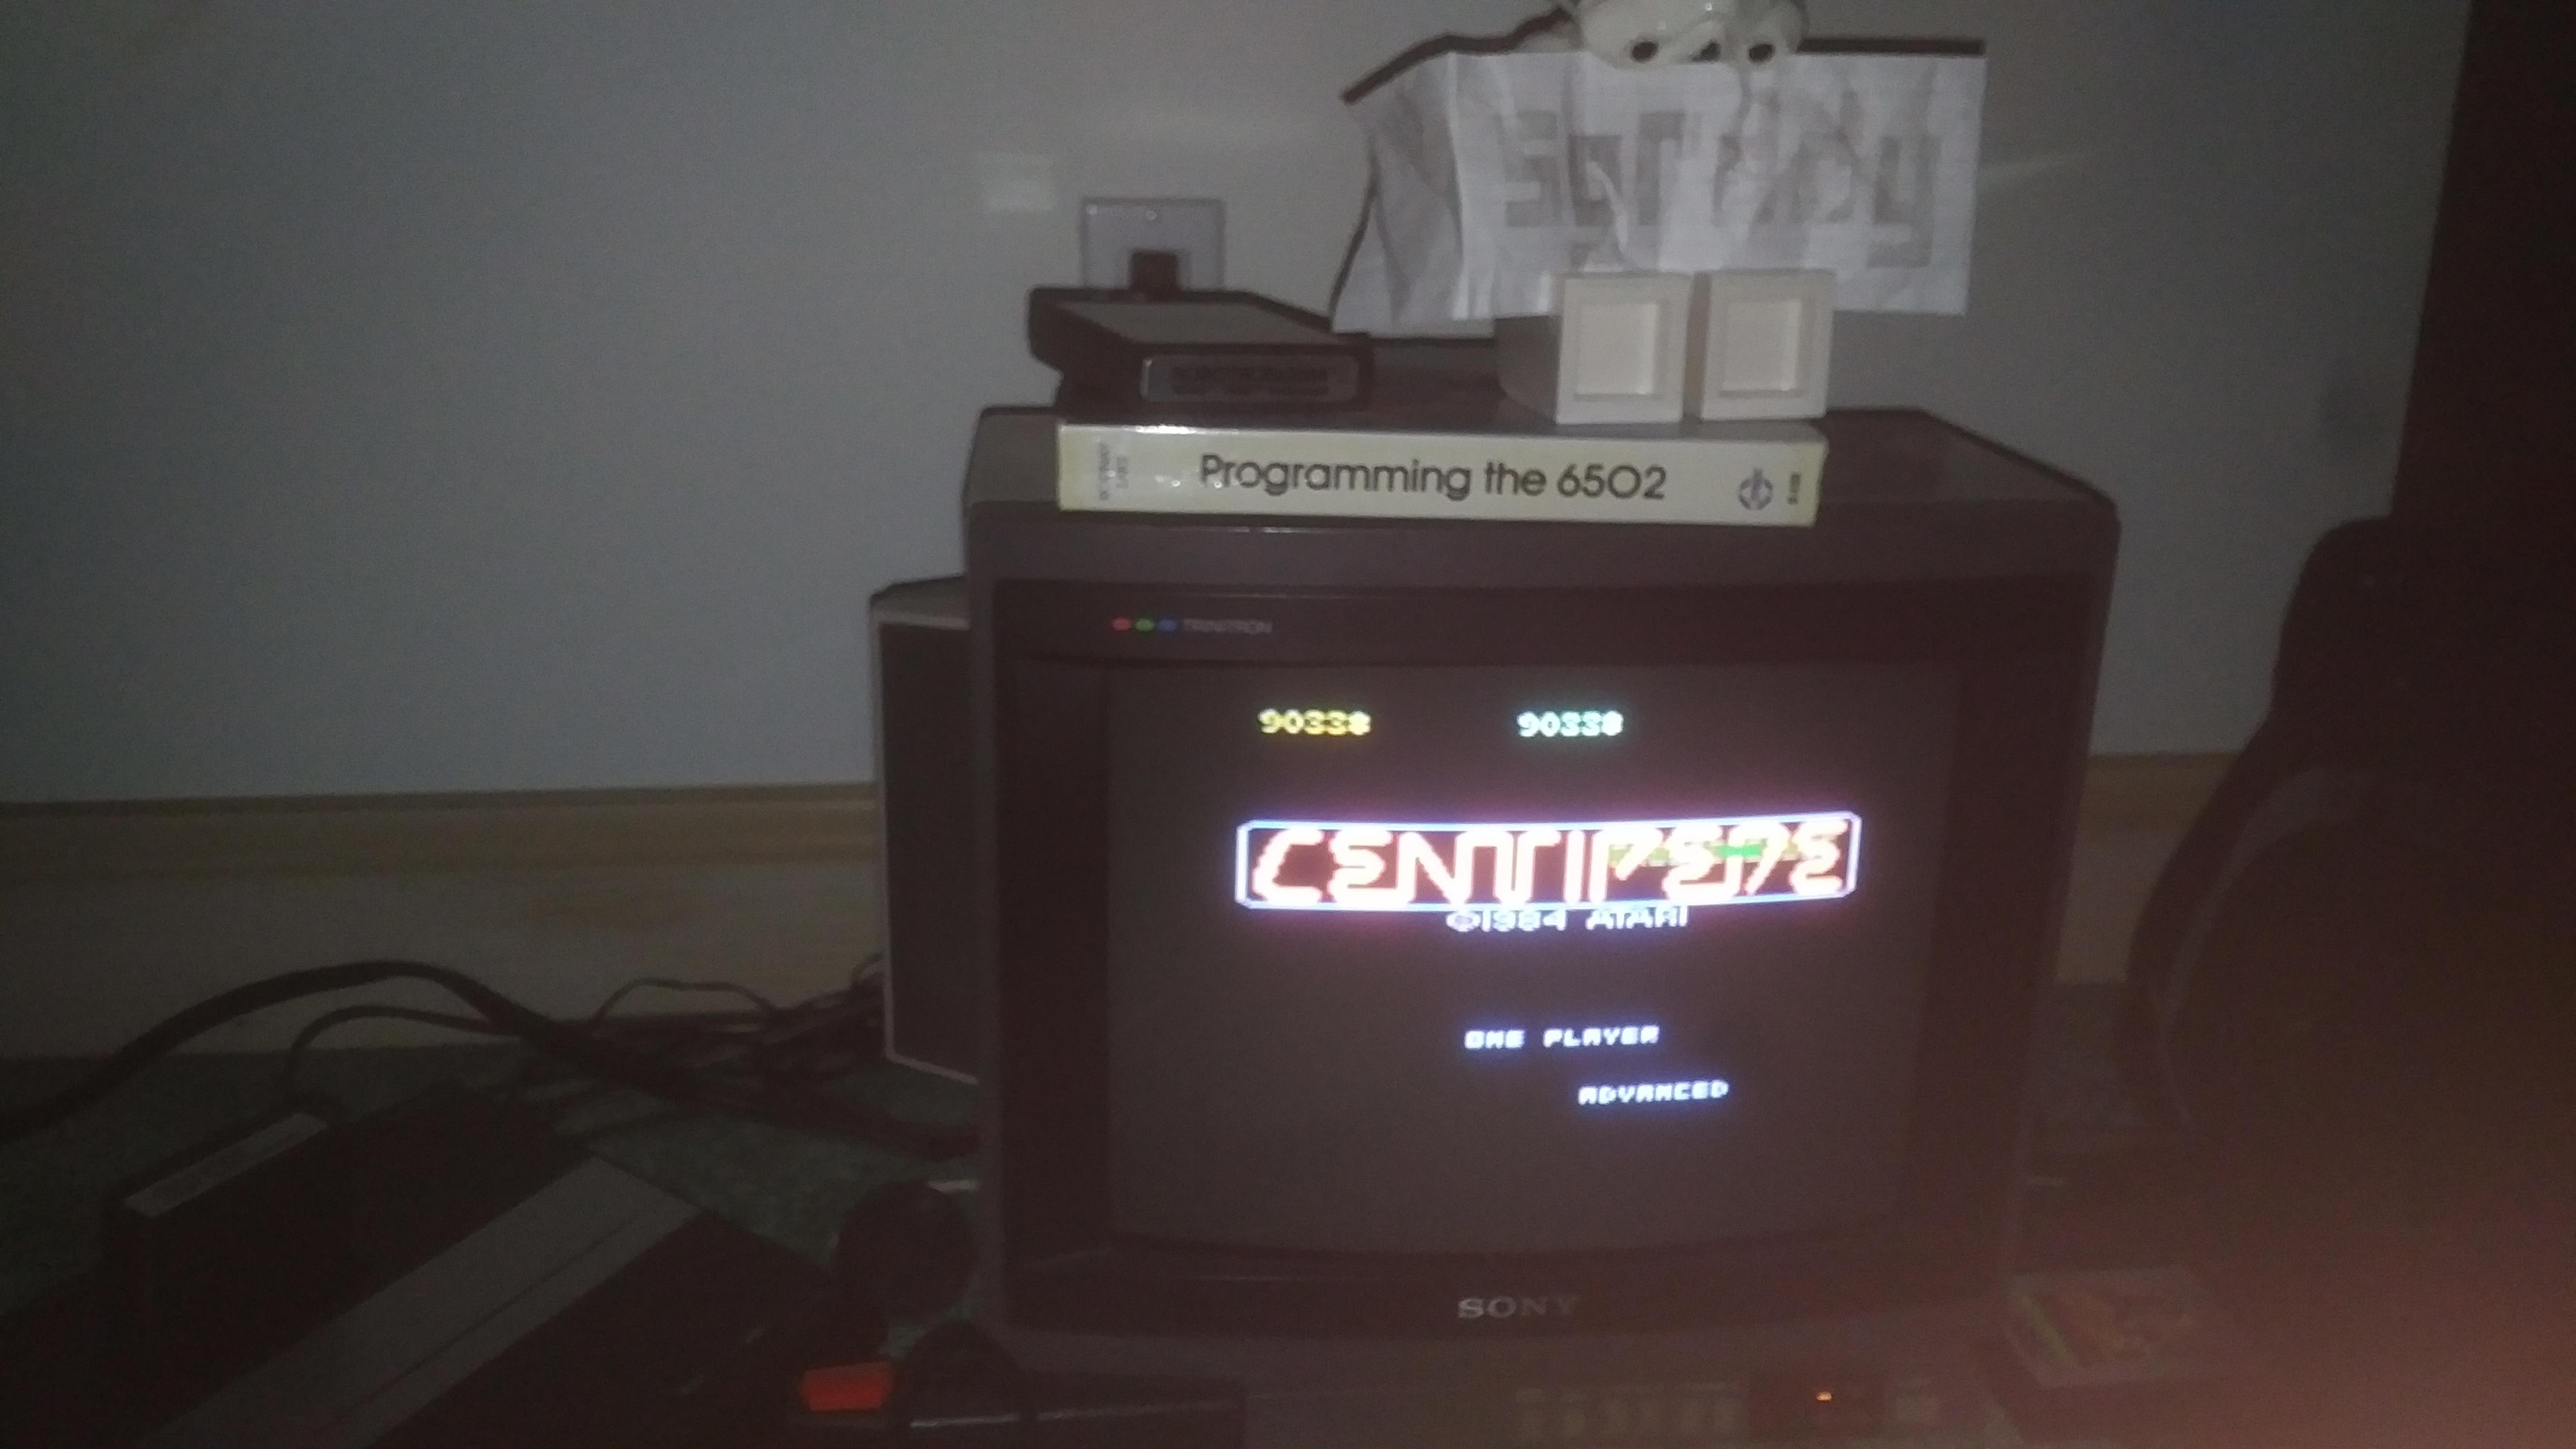 Centipede: Advanced 90,338 points